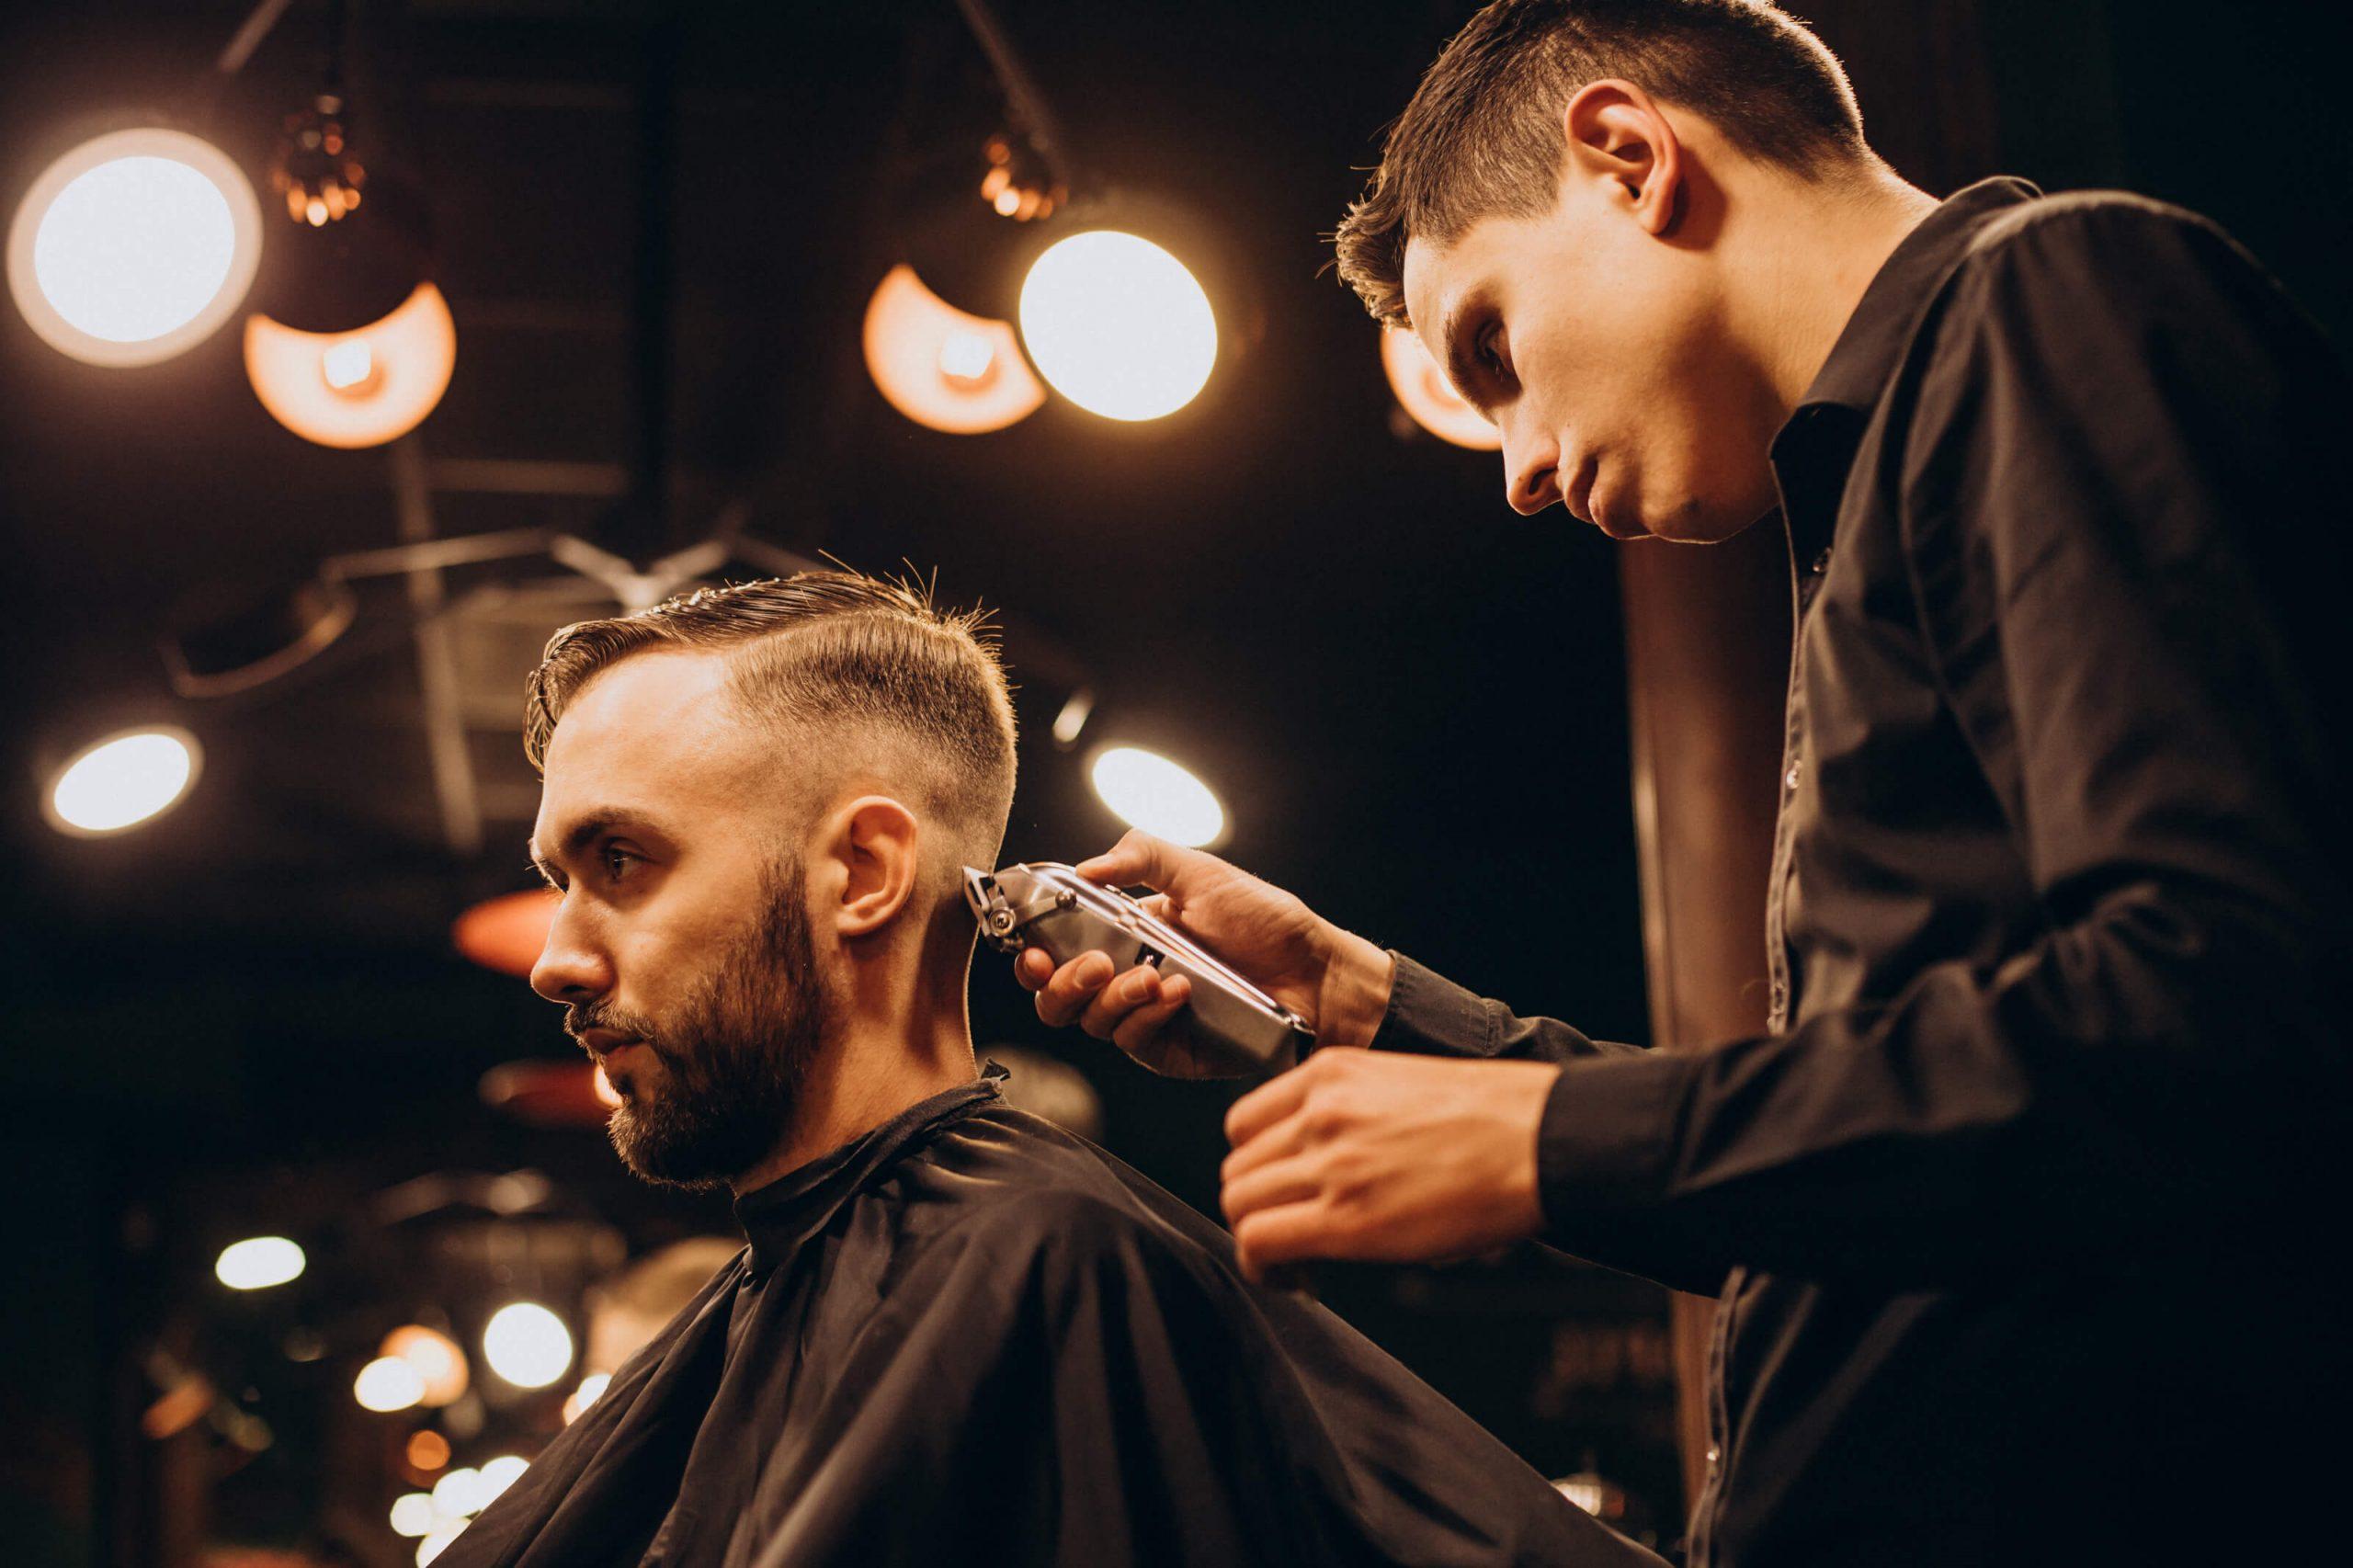 Medellin barbers